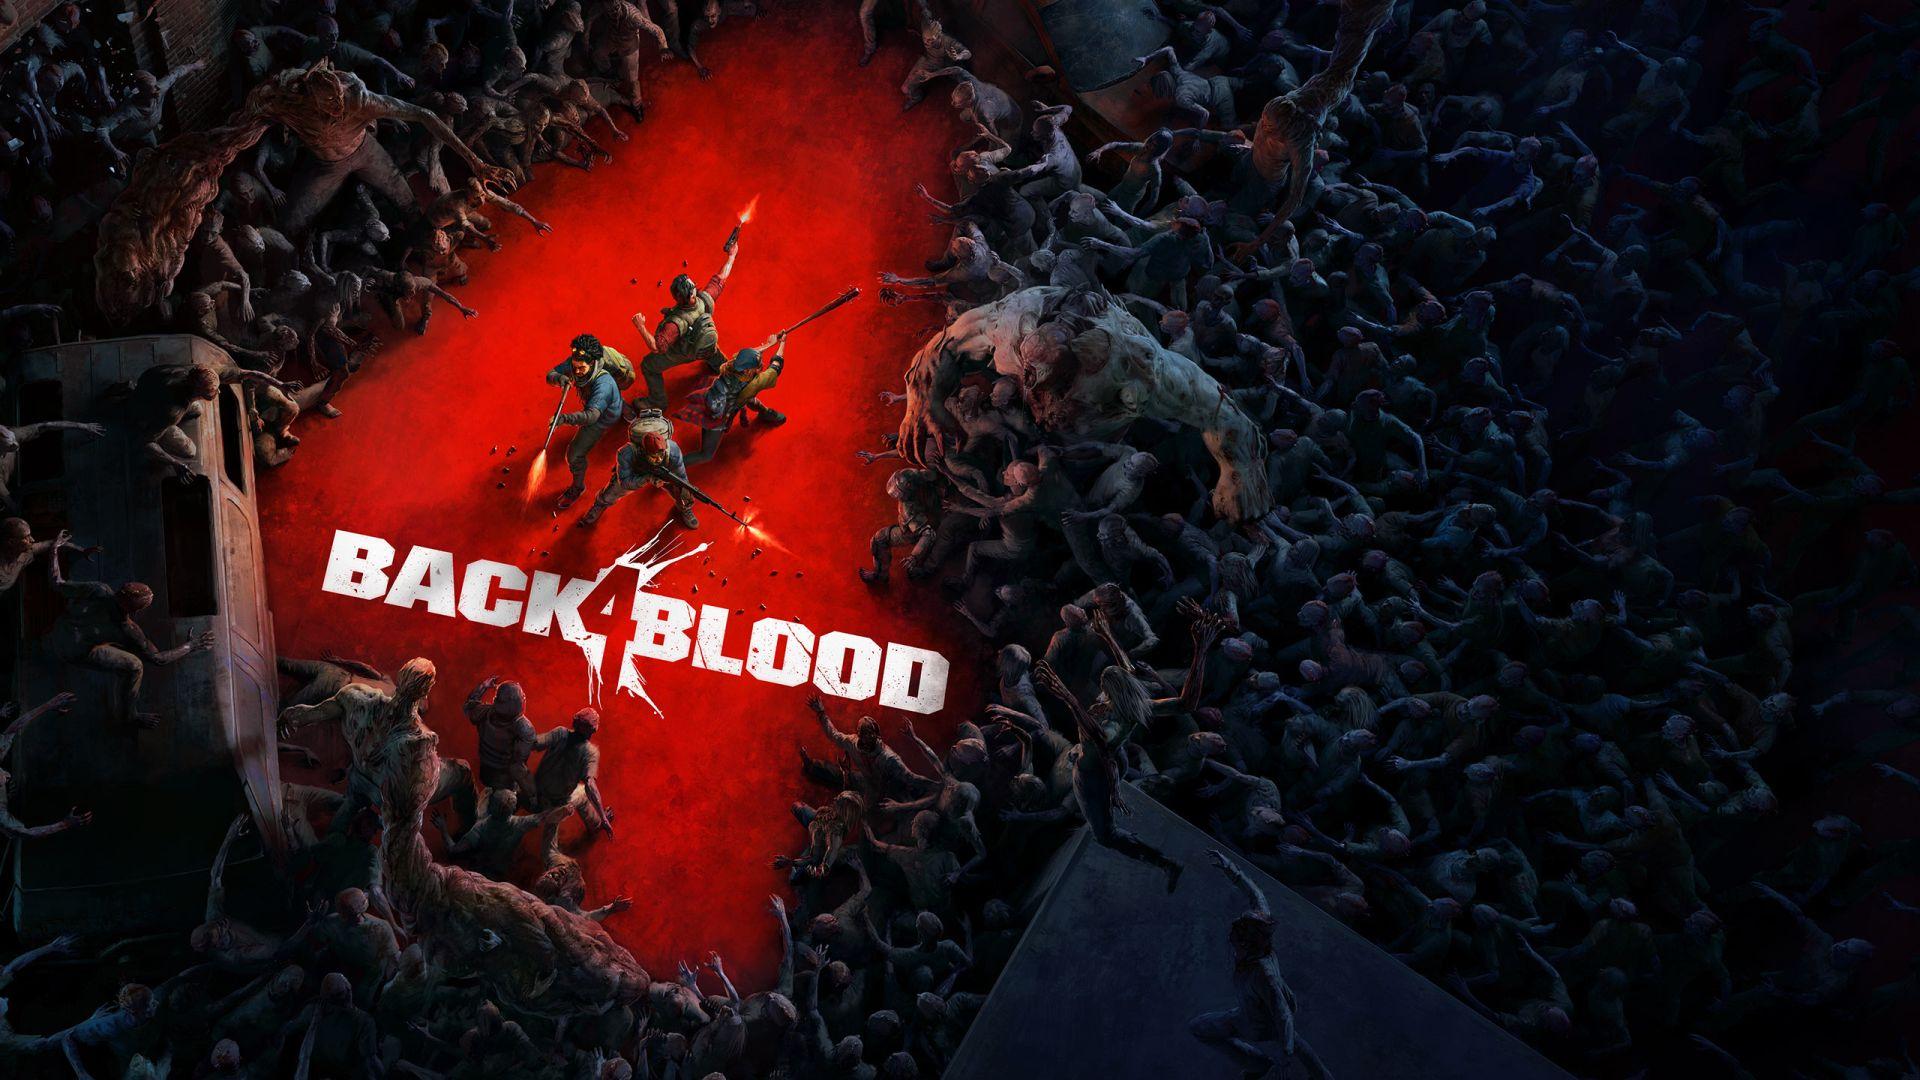 back 4 blood launch trailer